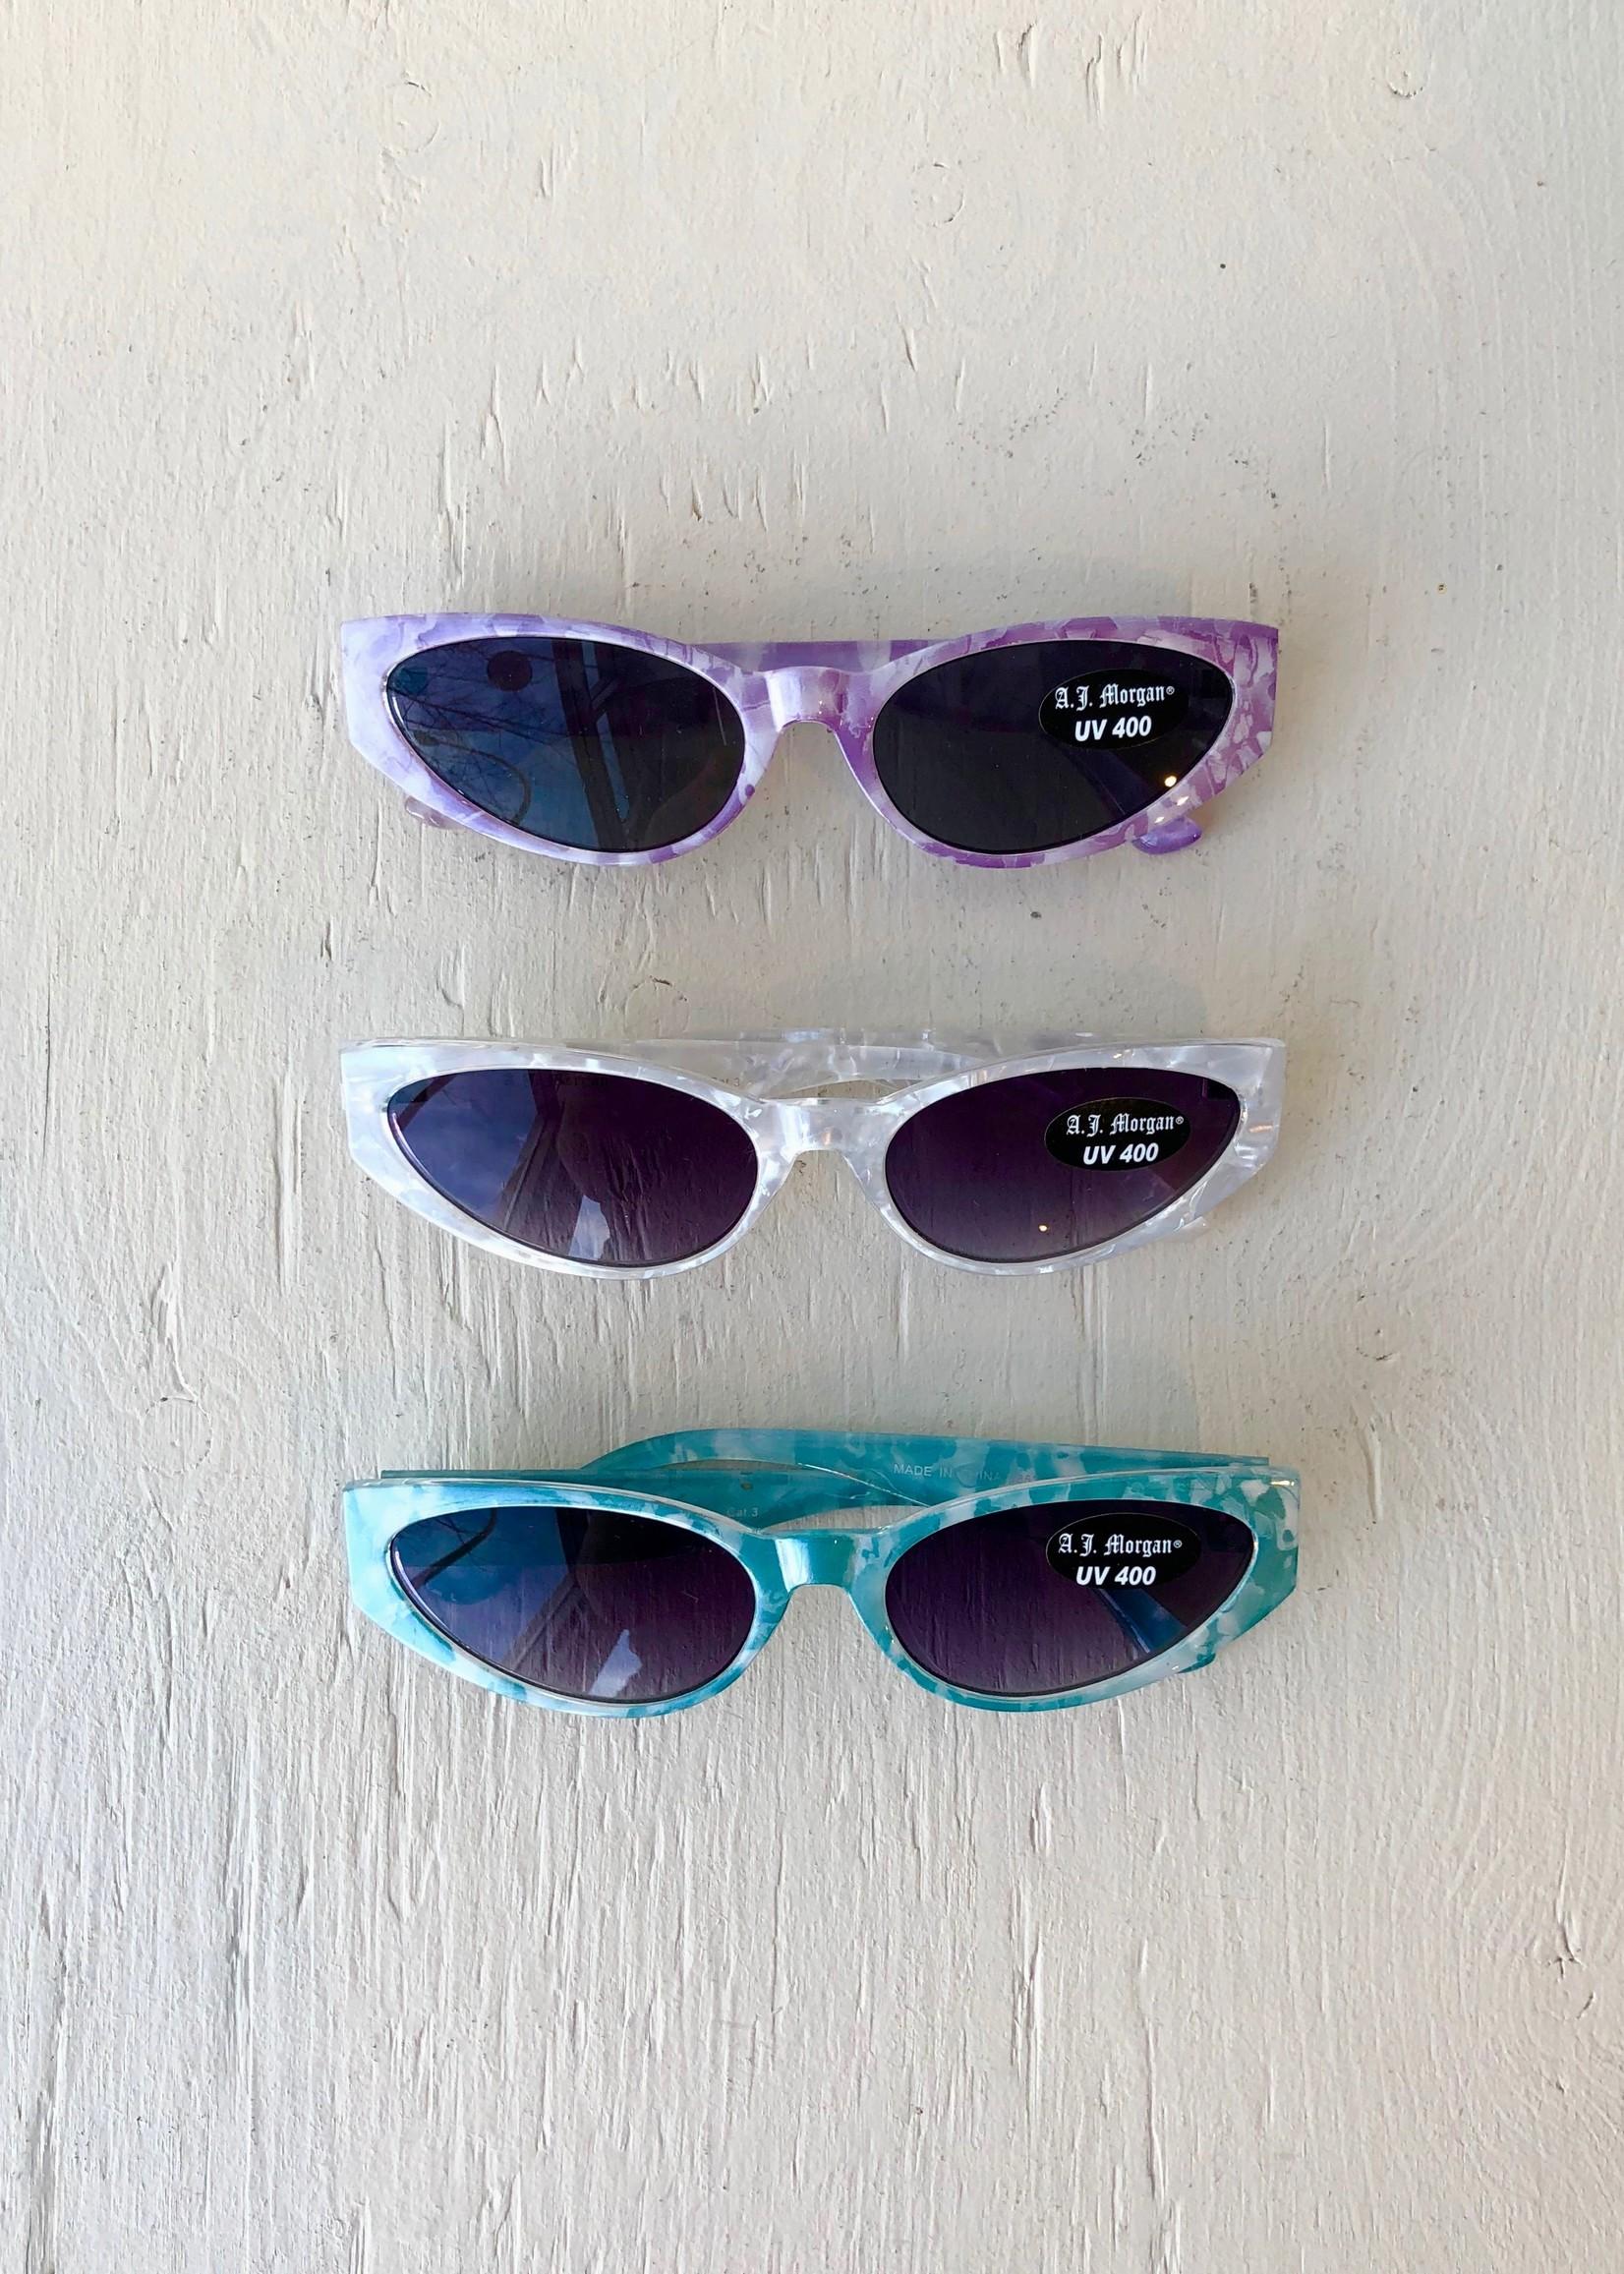 A. J. Morgan Pants on Fire sunglasses